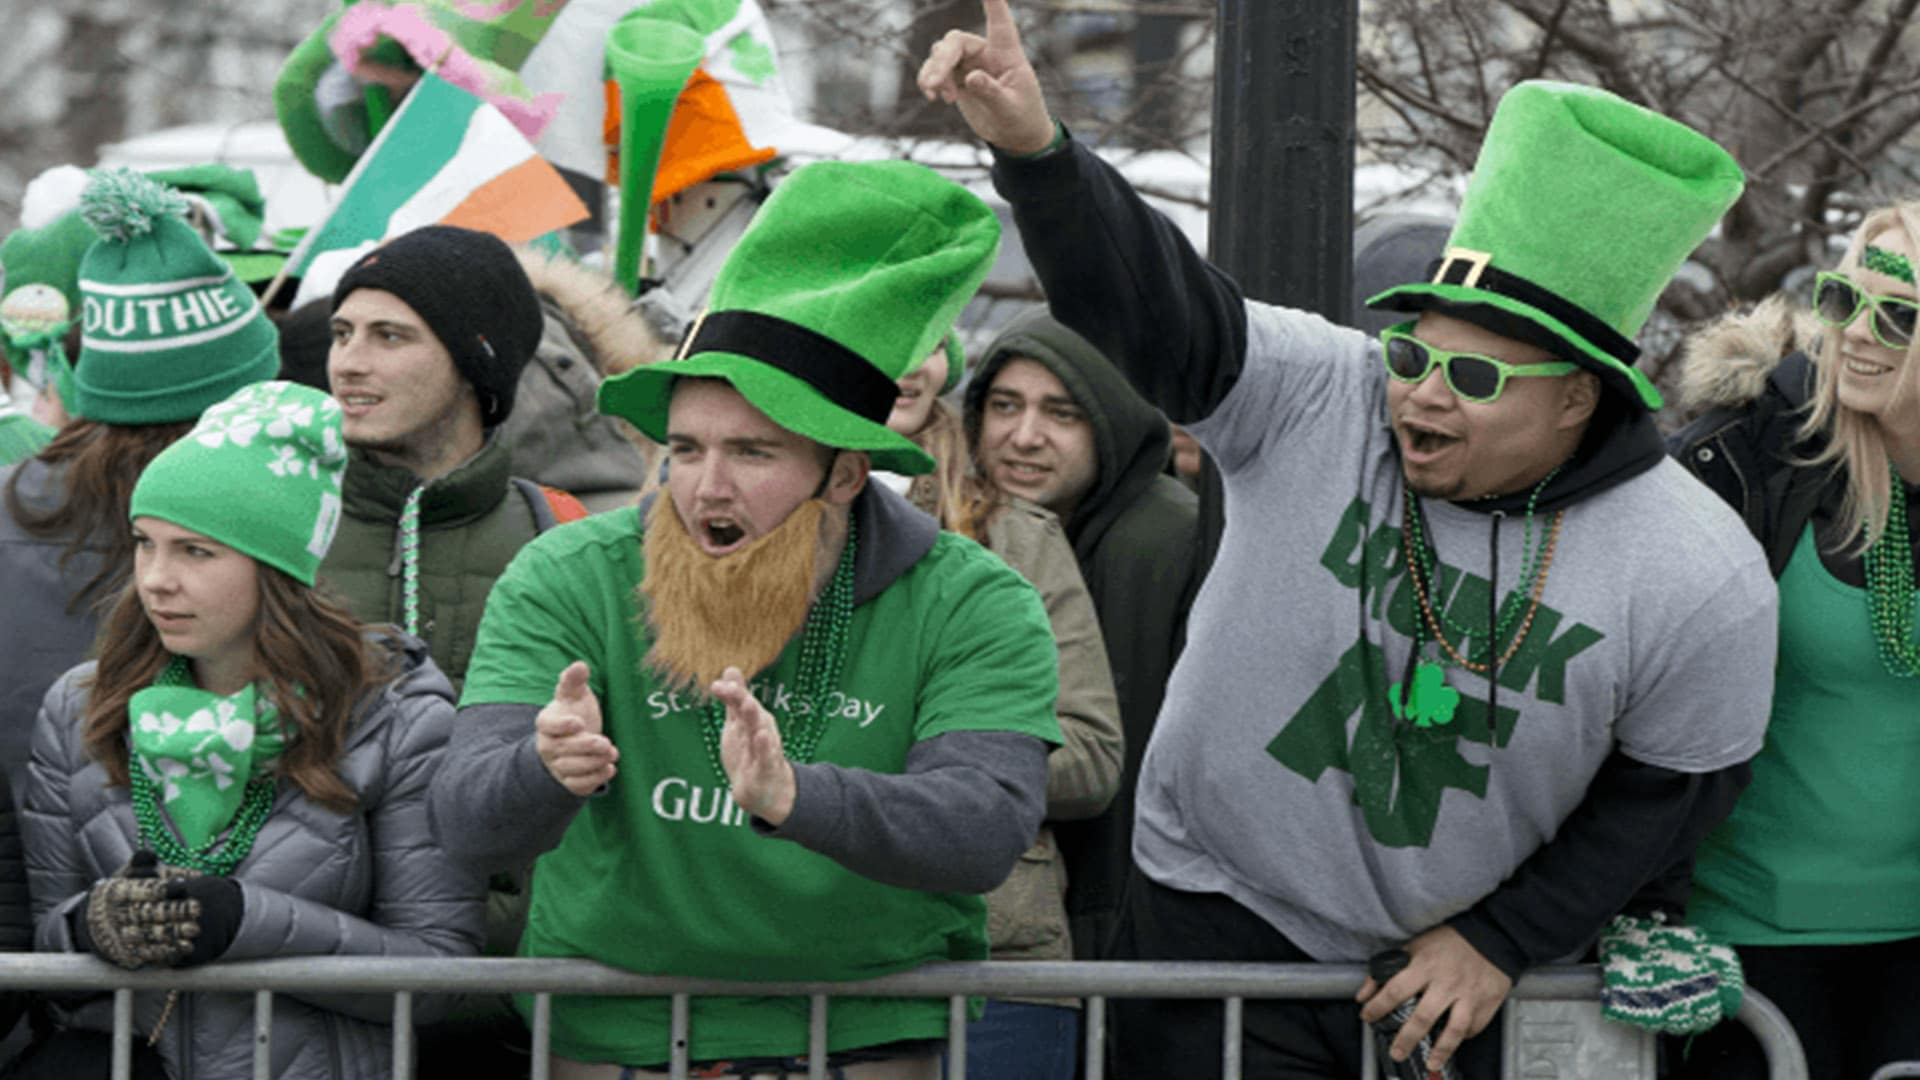 How Fake Irish Boston Catholics Ruined Saint Patricks Day & Slandered Saint Patrick with Joe Doyle